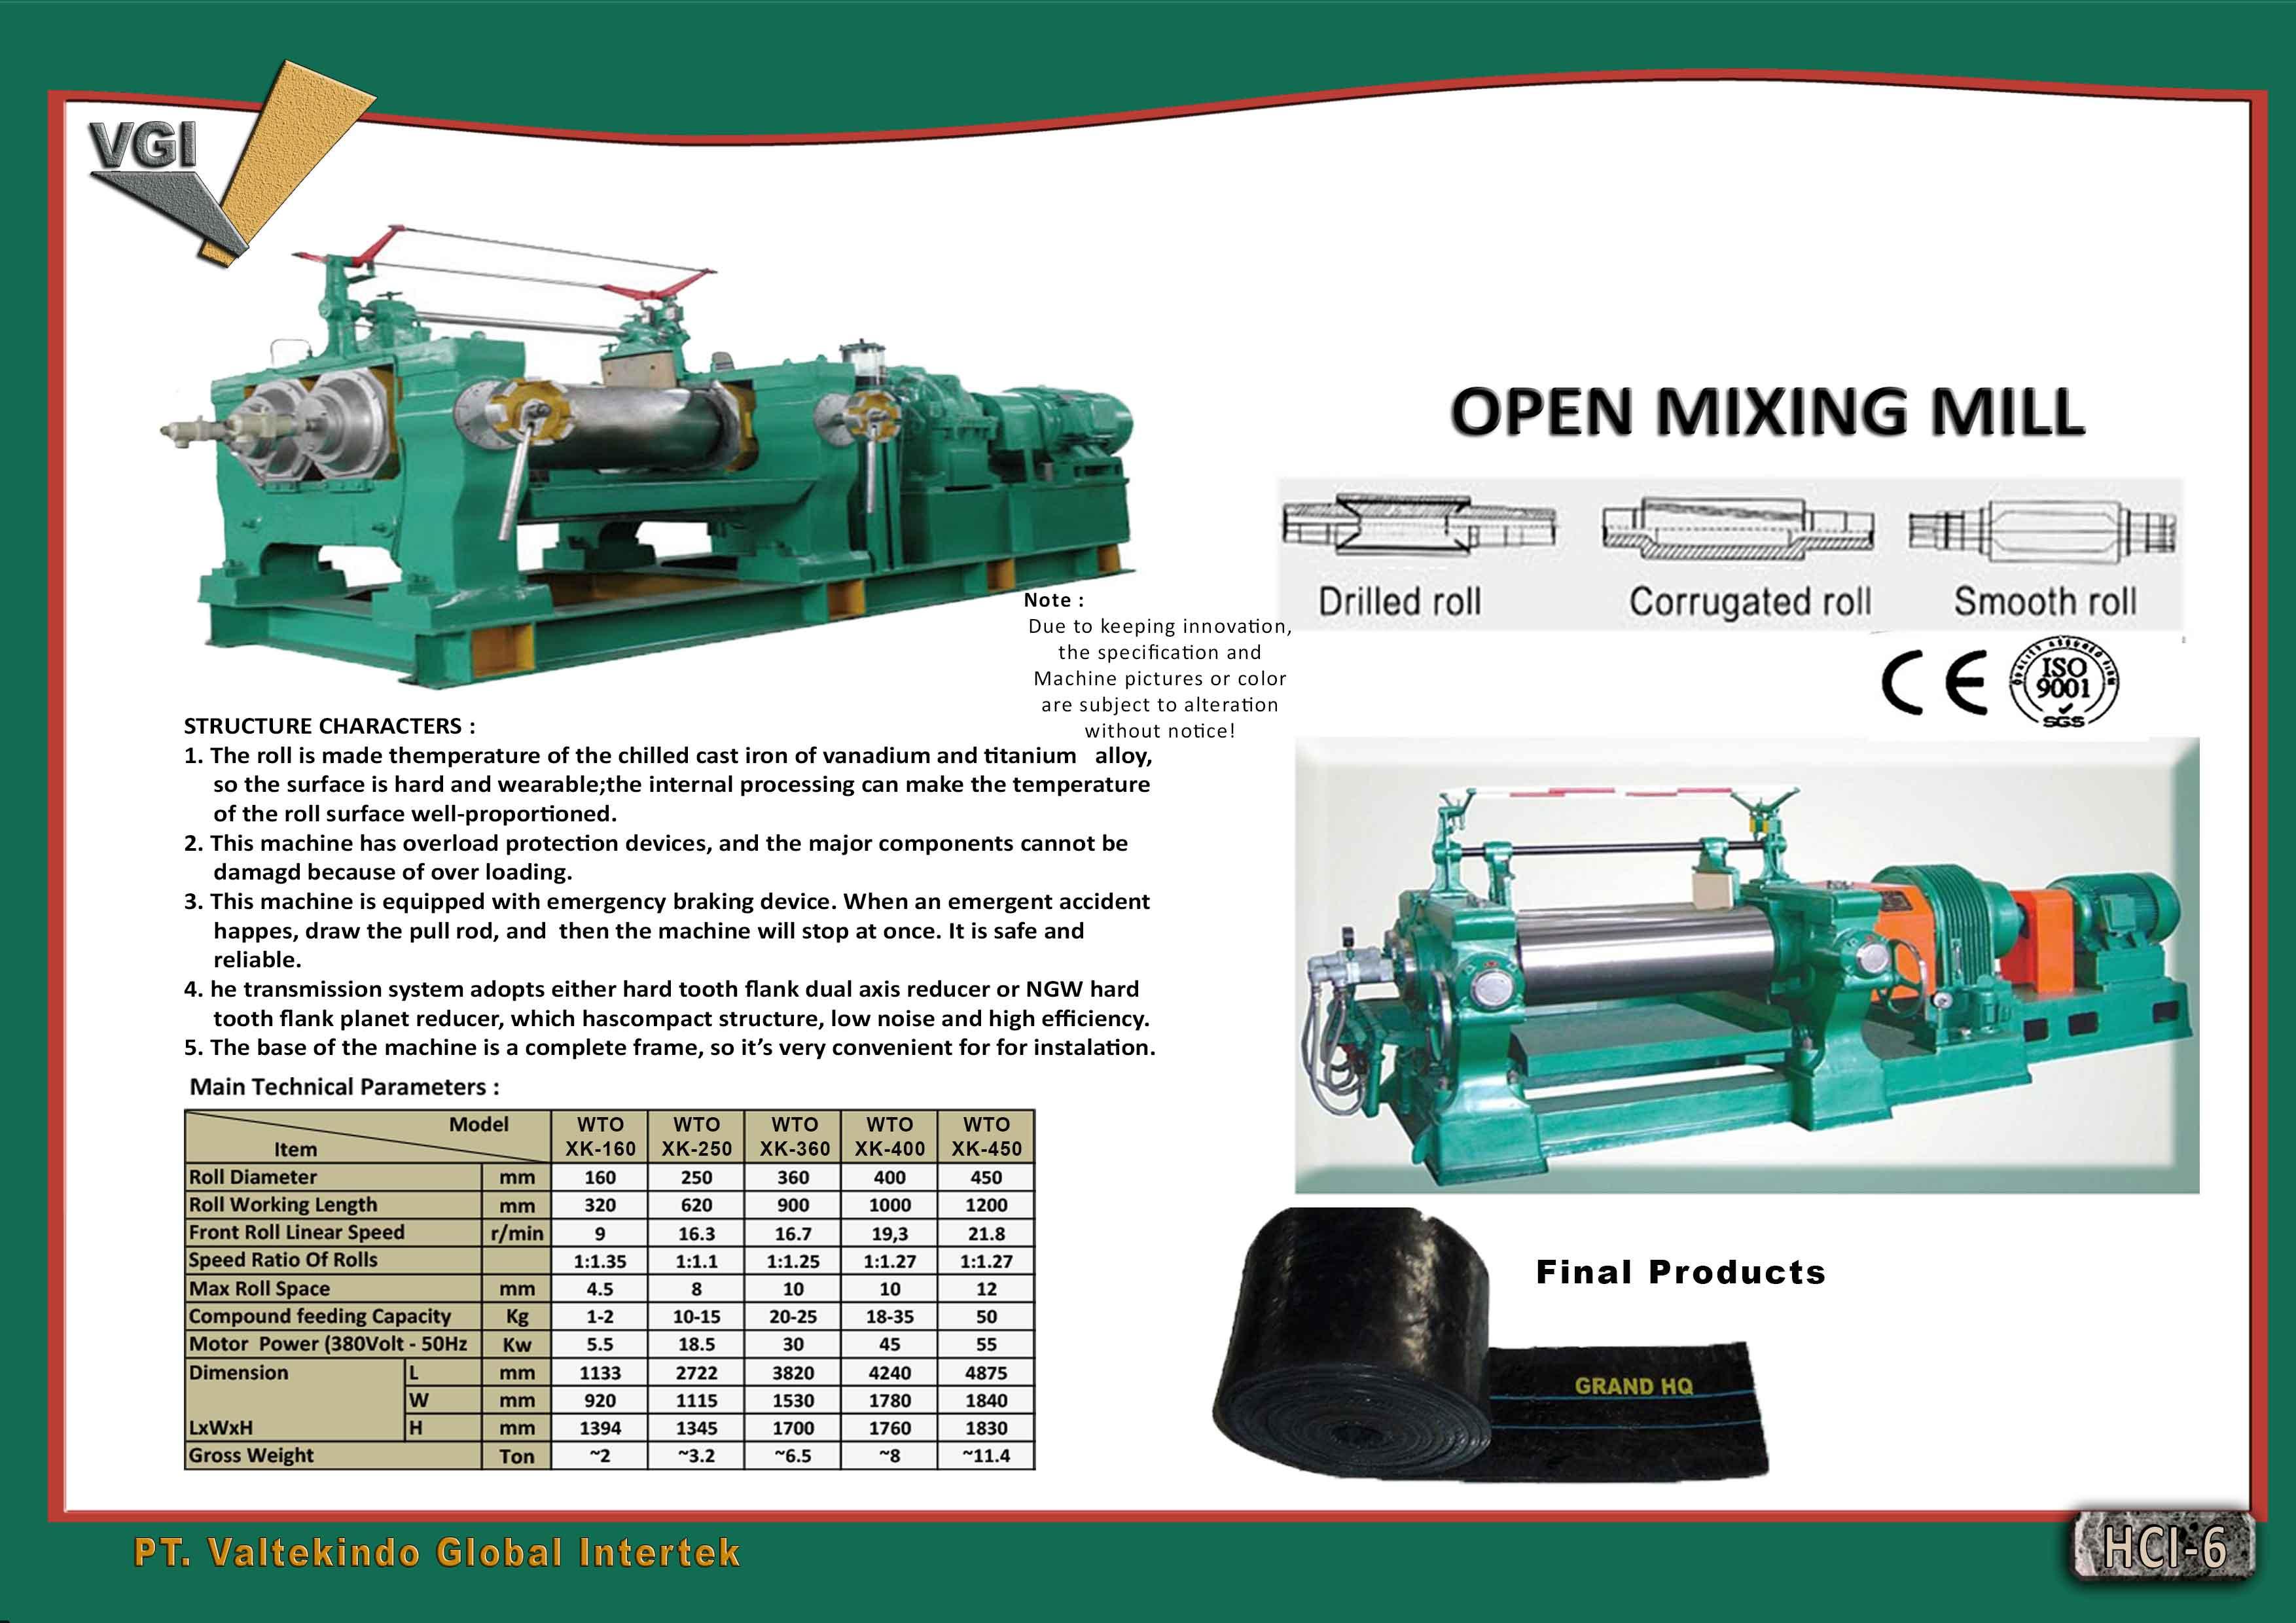 jual mesin, harga mesin, jual mesin bandung, distributor mesin, jual mesin karet, daur ulang karet, daur ulang plastik, mesin pertanian Open Mixing Mill Open Mixing Mill